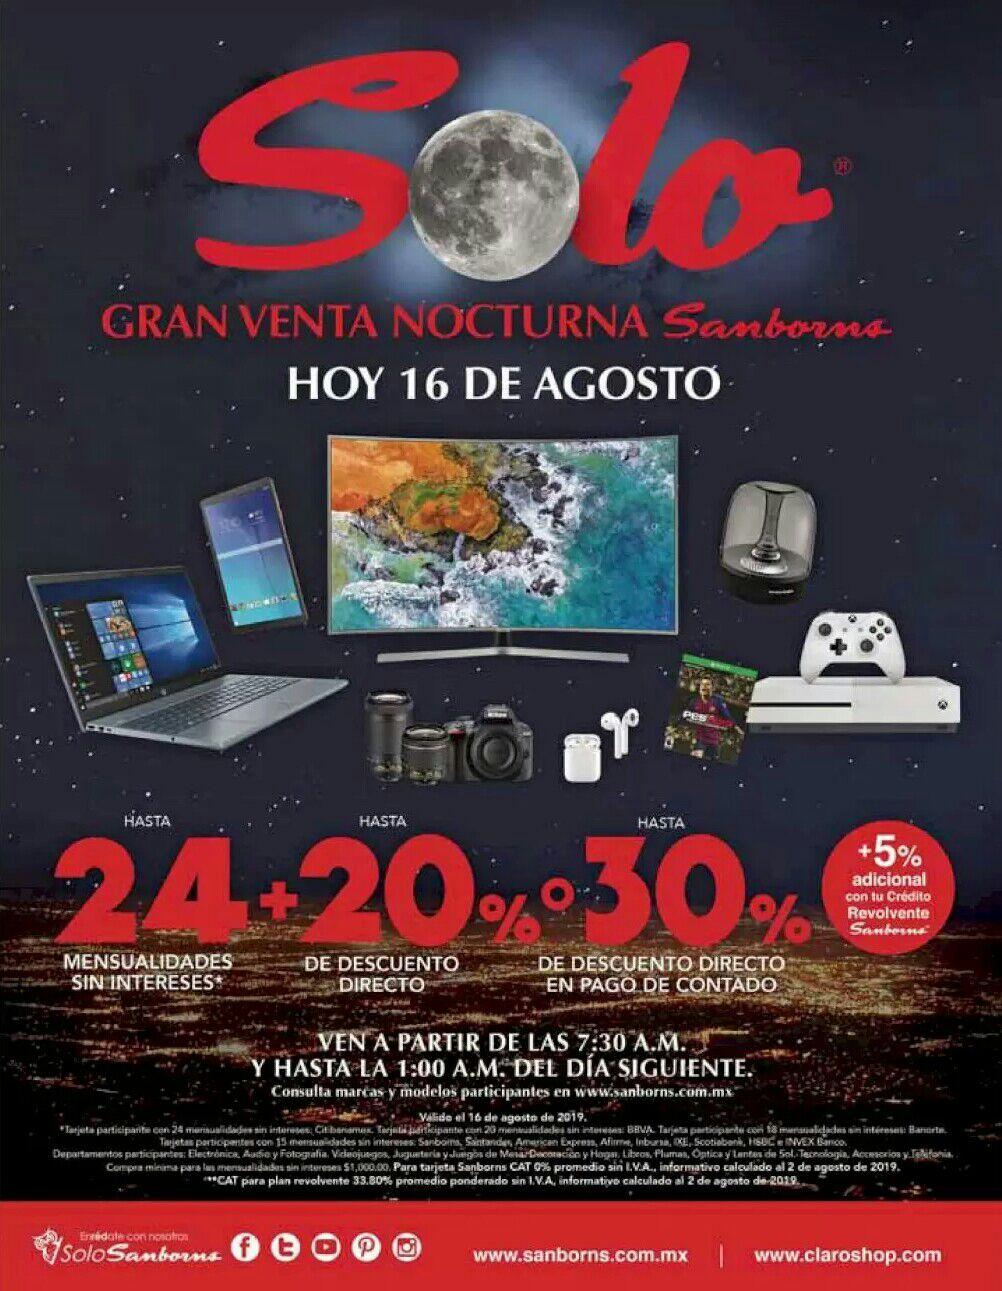 Sanborns: Gran Venta Nocturna 16 Agosto: Hasta 24 MSI + hasta 20% desc. directo... ó... Hasta 30% desc. directo